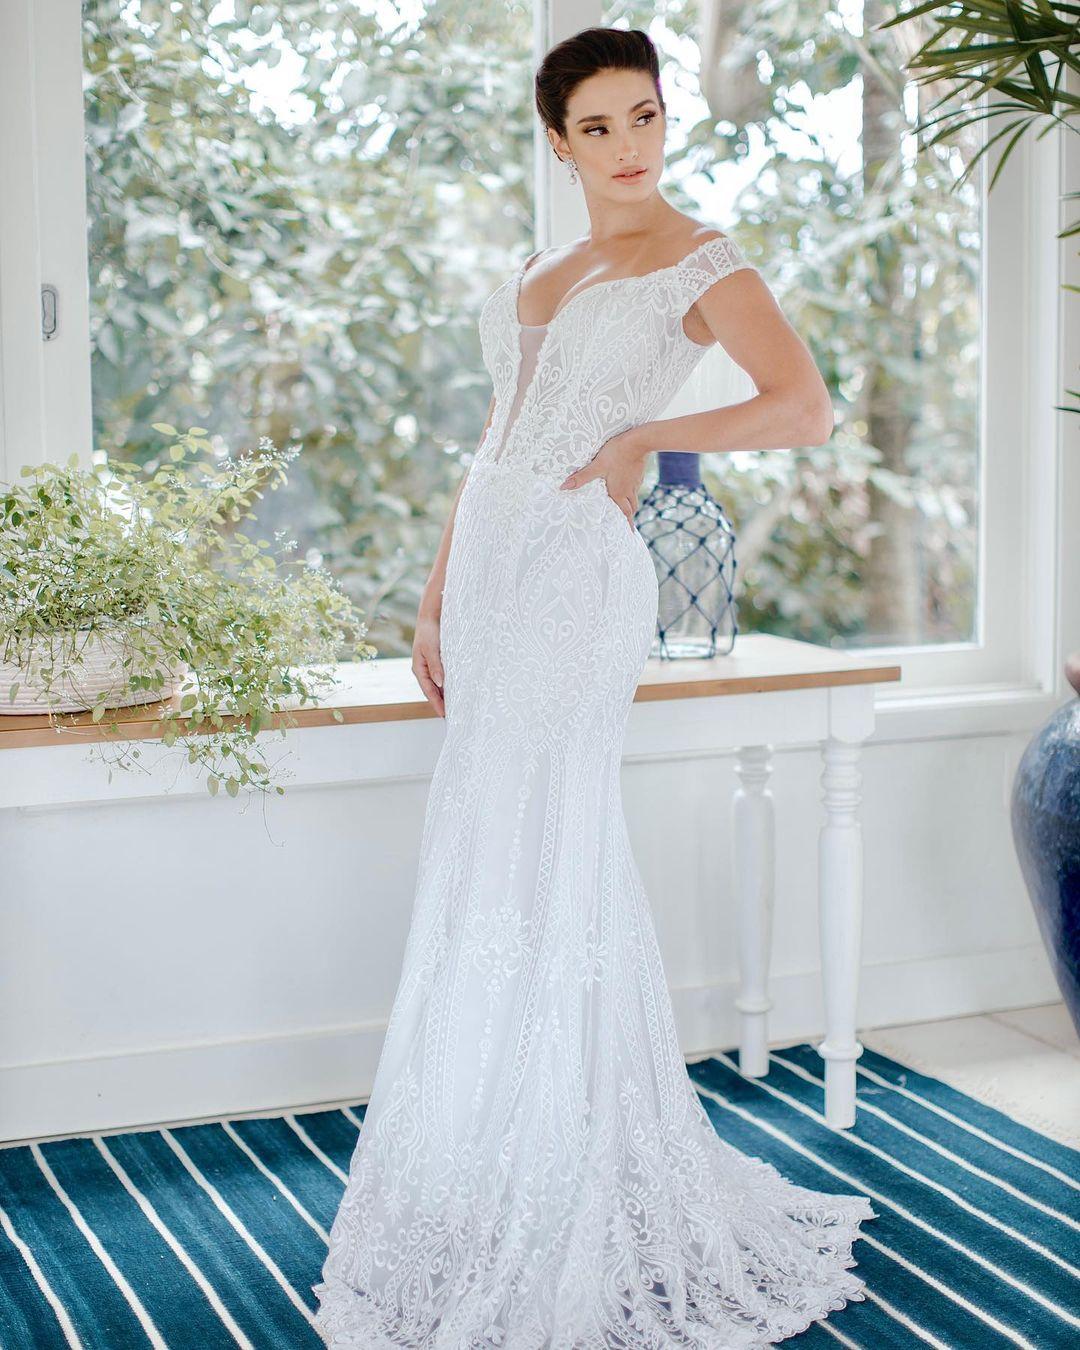 luma russo, top 3 de miss supranational brazil 2020. - Página 3 Russol16